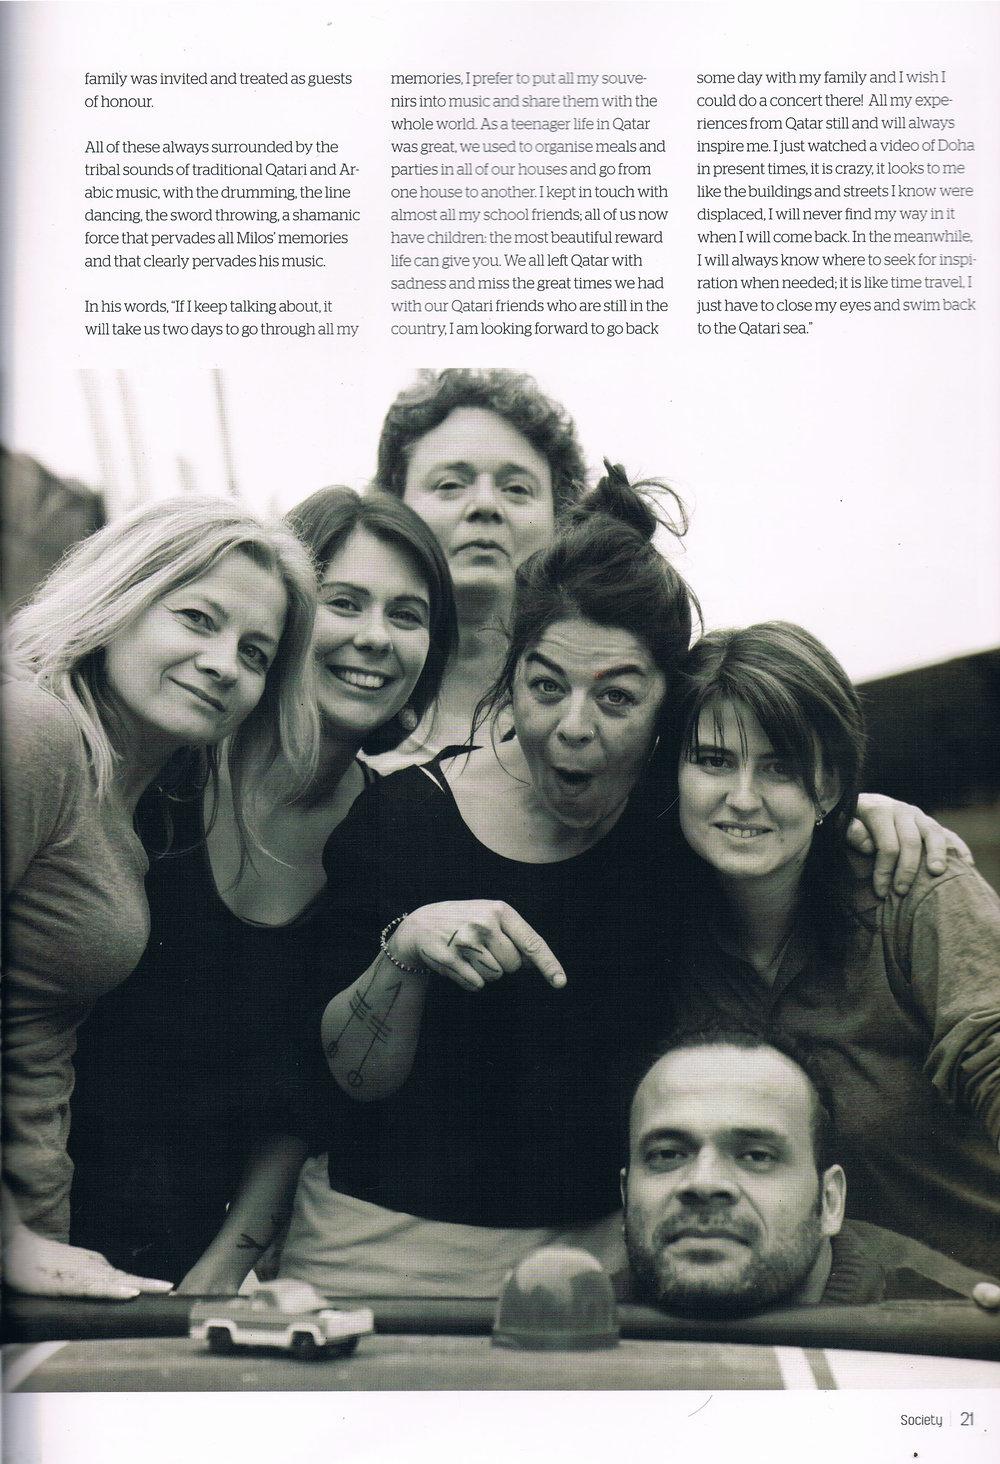 Society page 21.jpg